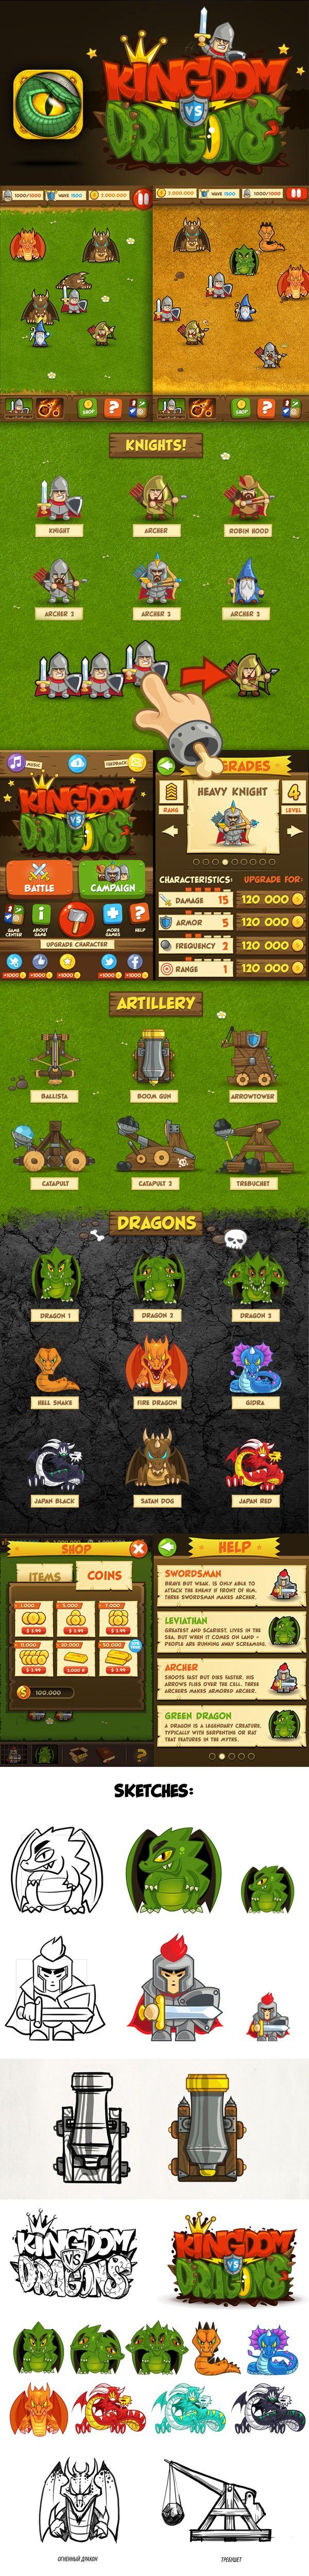 Kingdom Dragons by i-Free Design Studio, via Behance